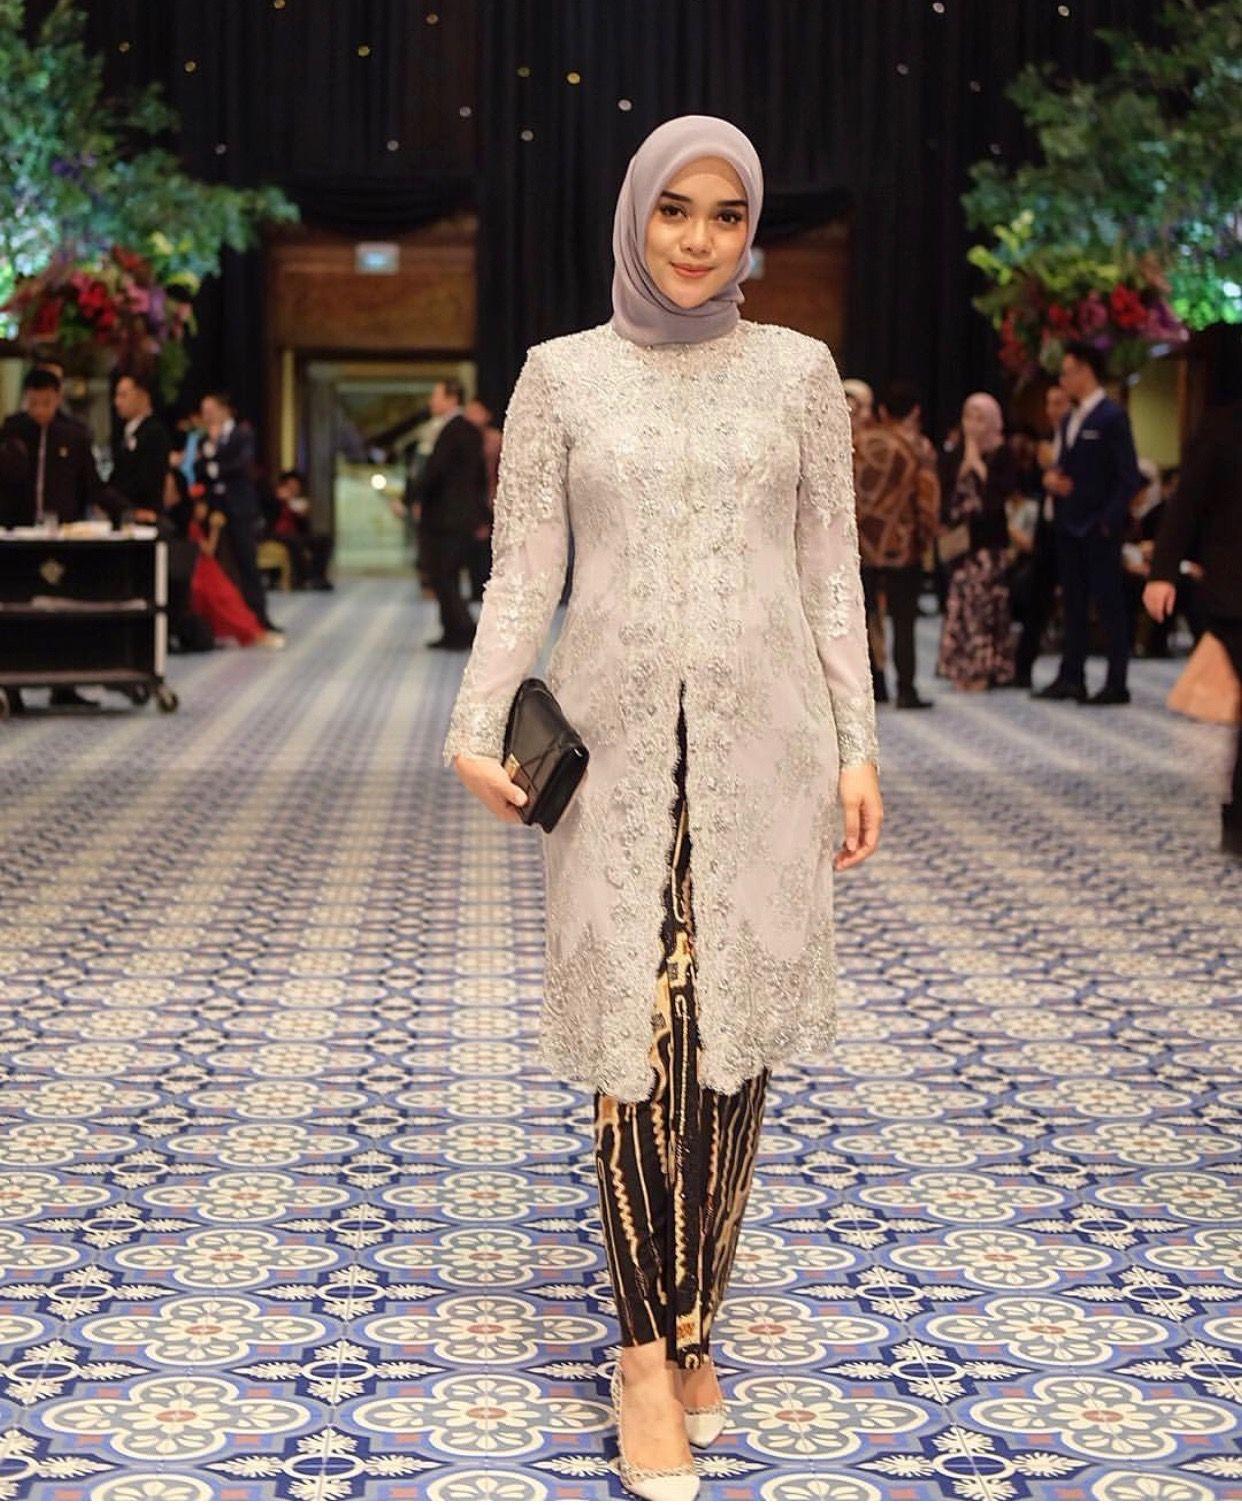 Pin oleh Mona Elgendy di Fashion Inspiration  Pakaian wanita